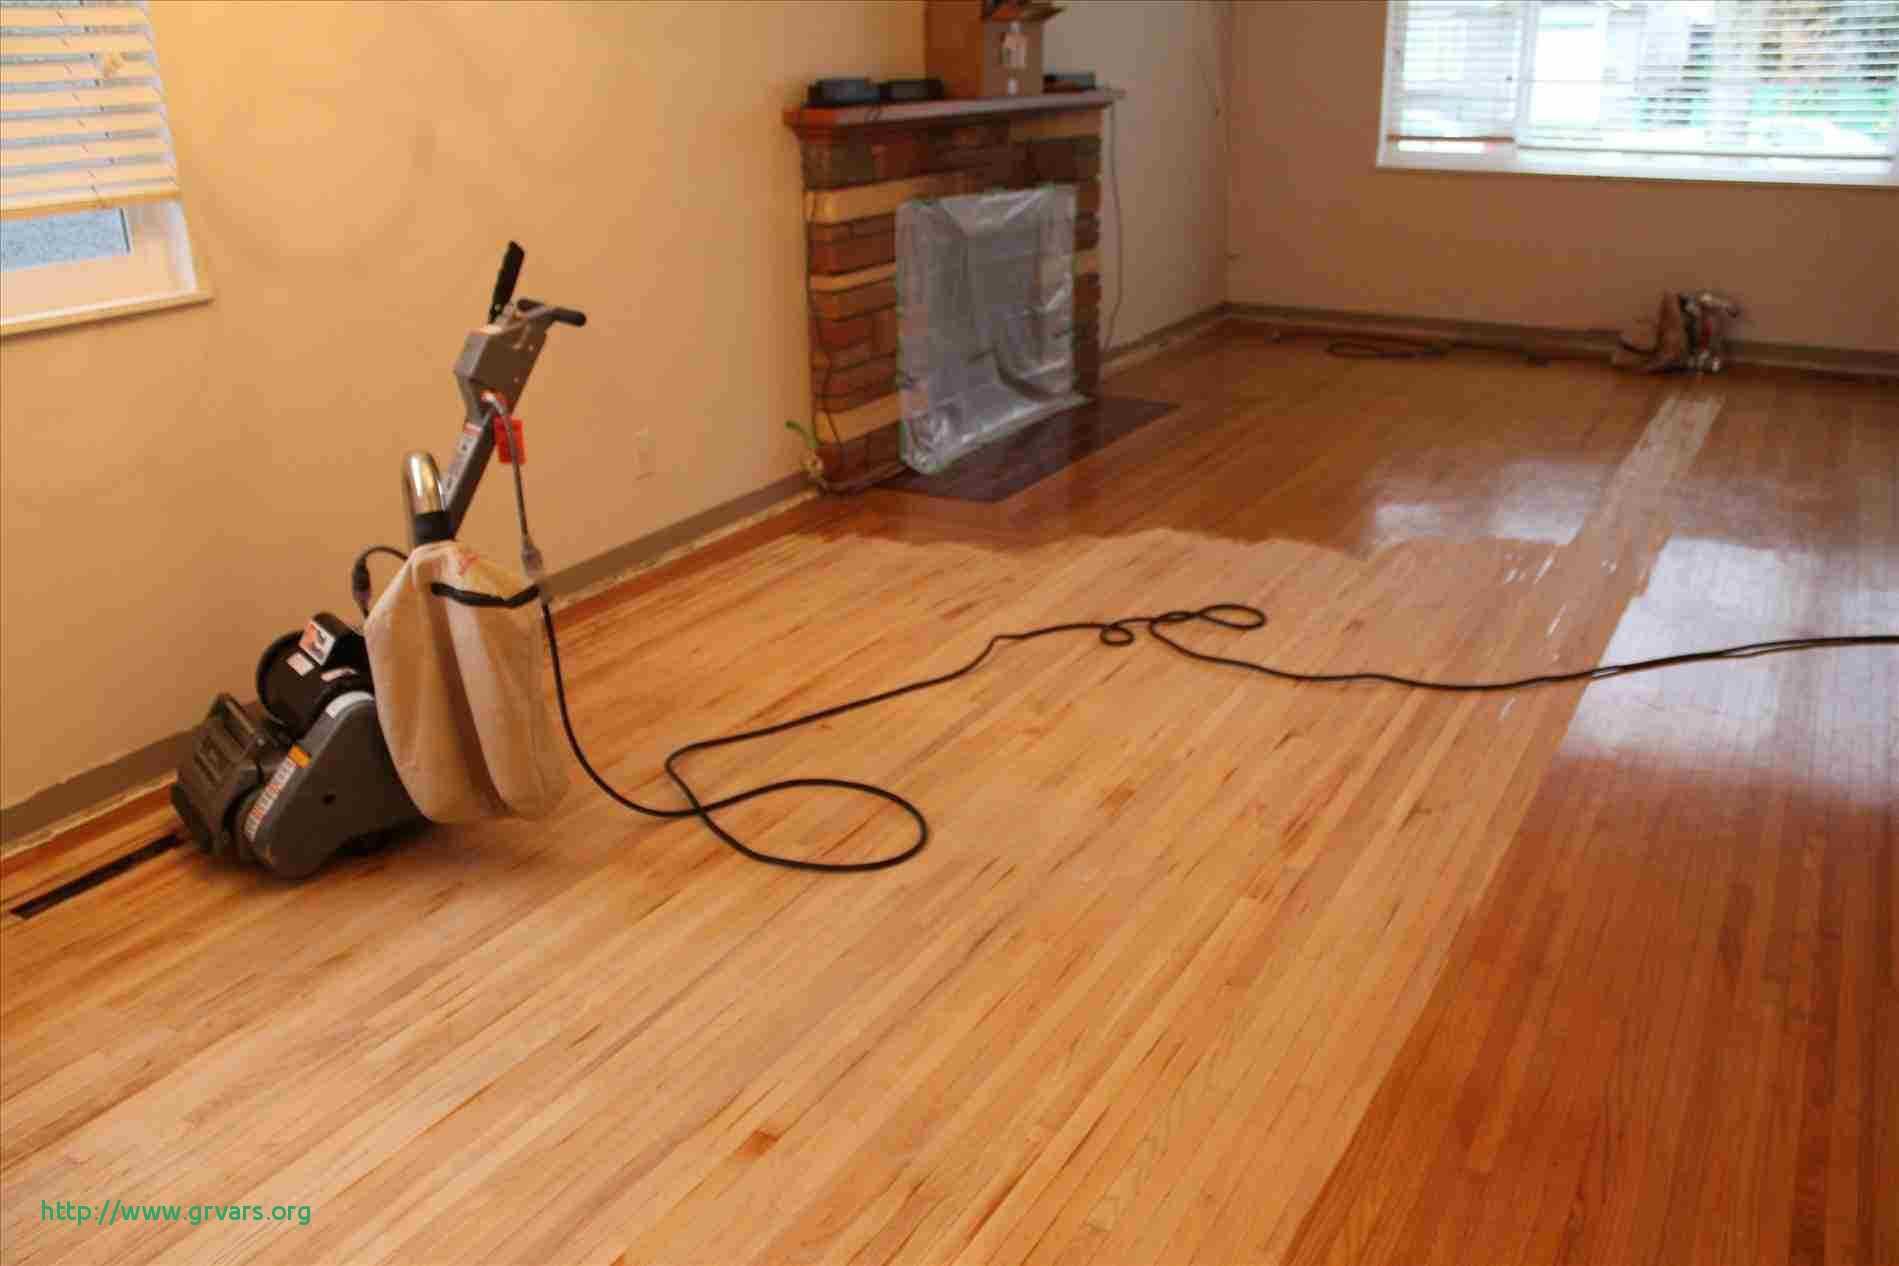 26 Stunning Hardwood Floor Sander Rental Lowes 2021 free download hardwood floor sander rental lowes of 24 nouveau does lowes rent floor sanders ideas blog with regard to floor sander clipart